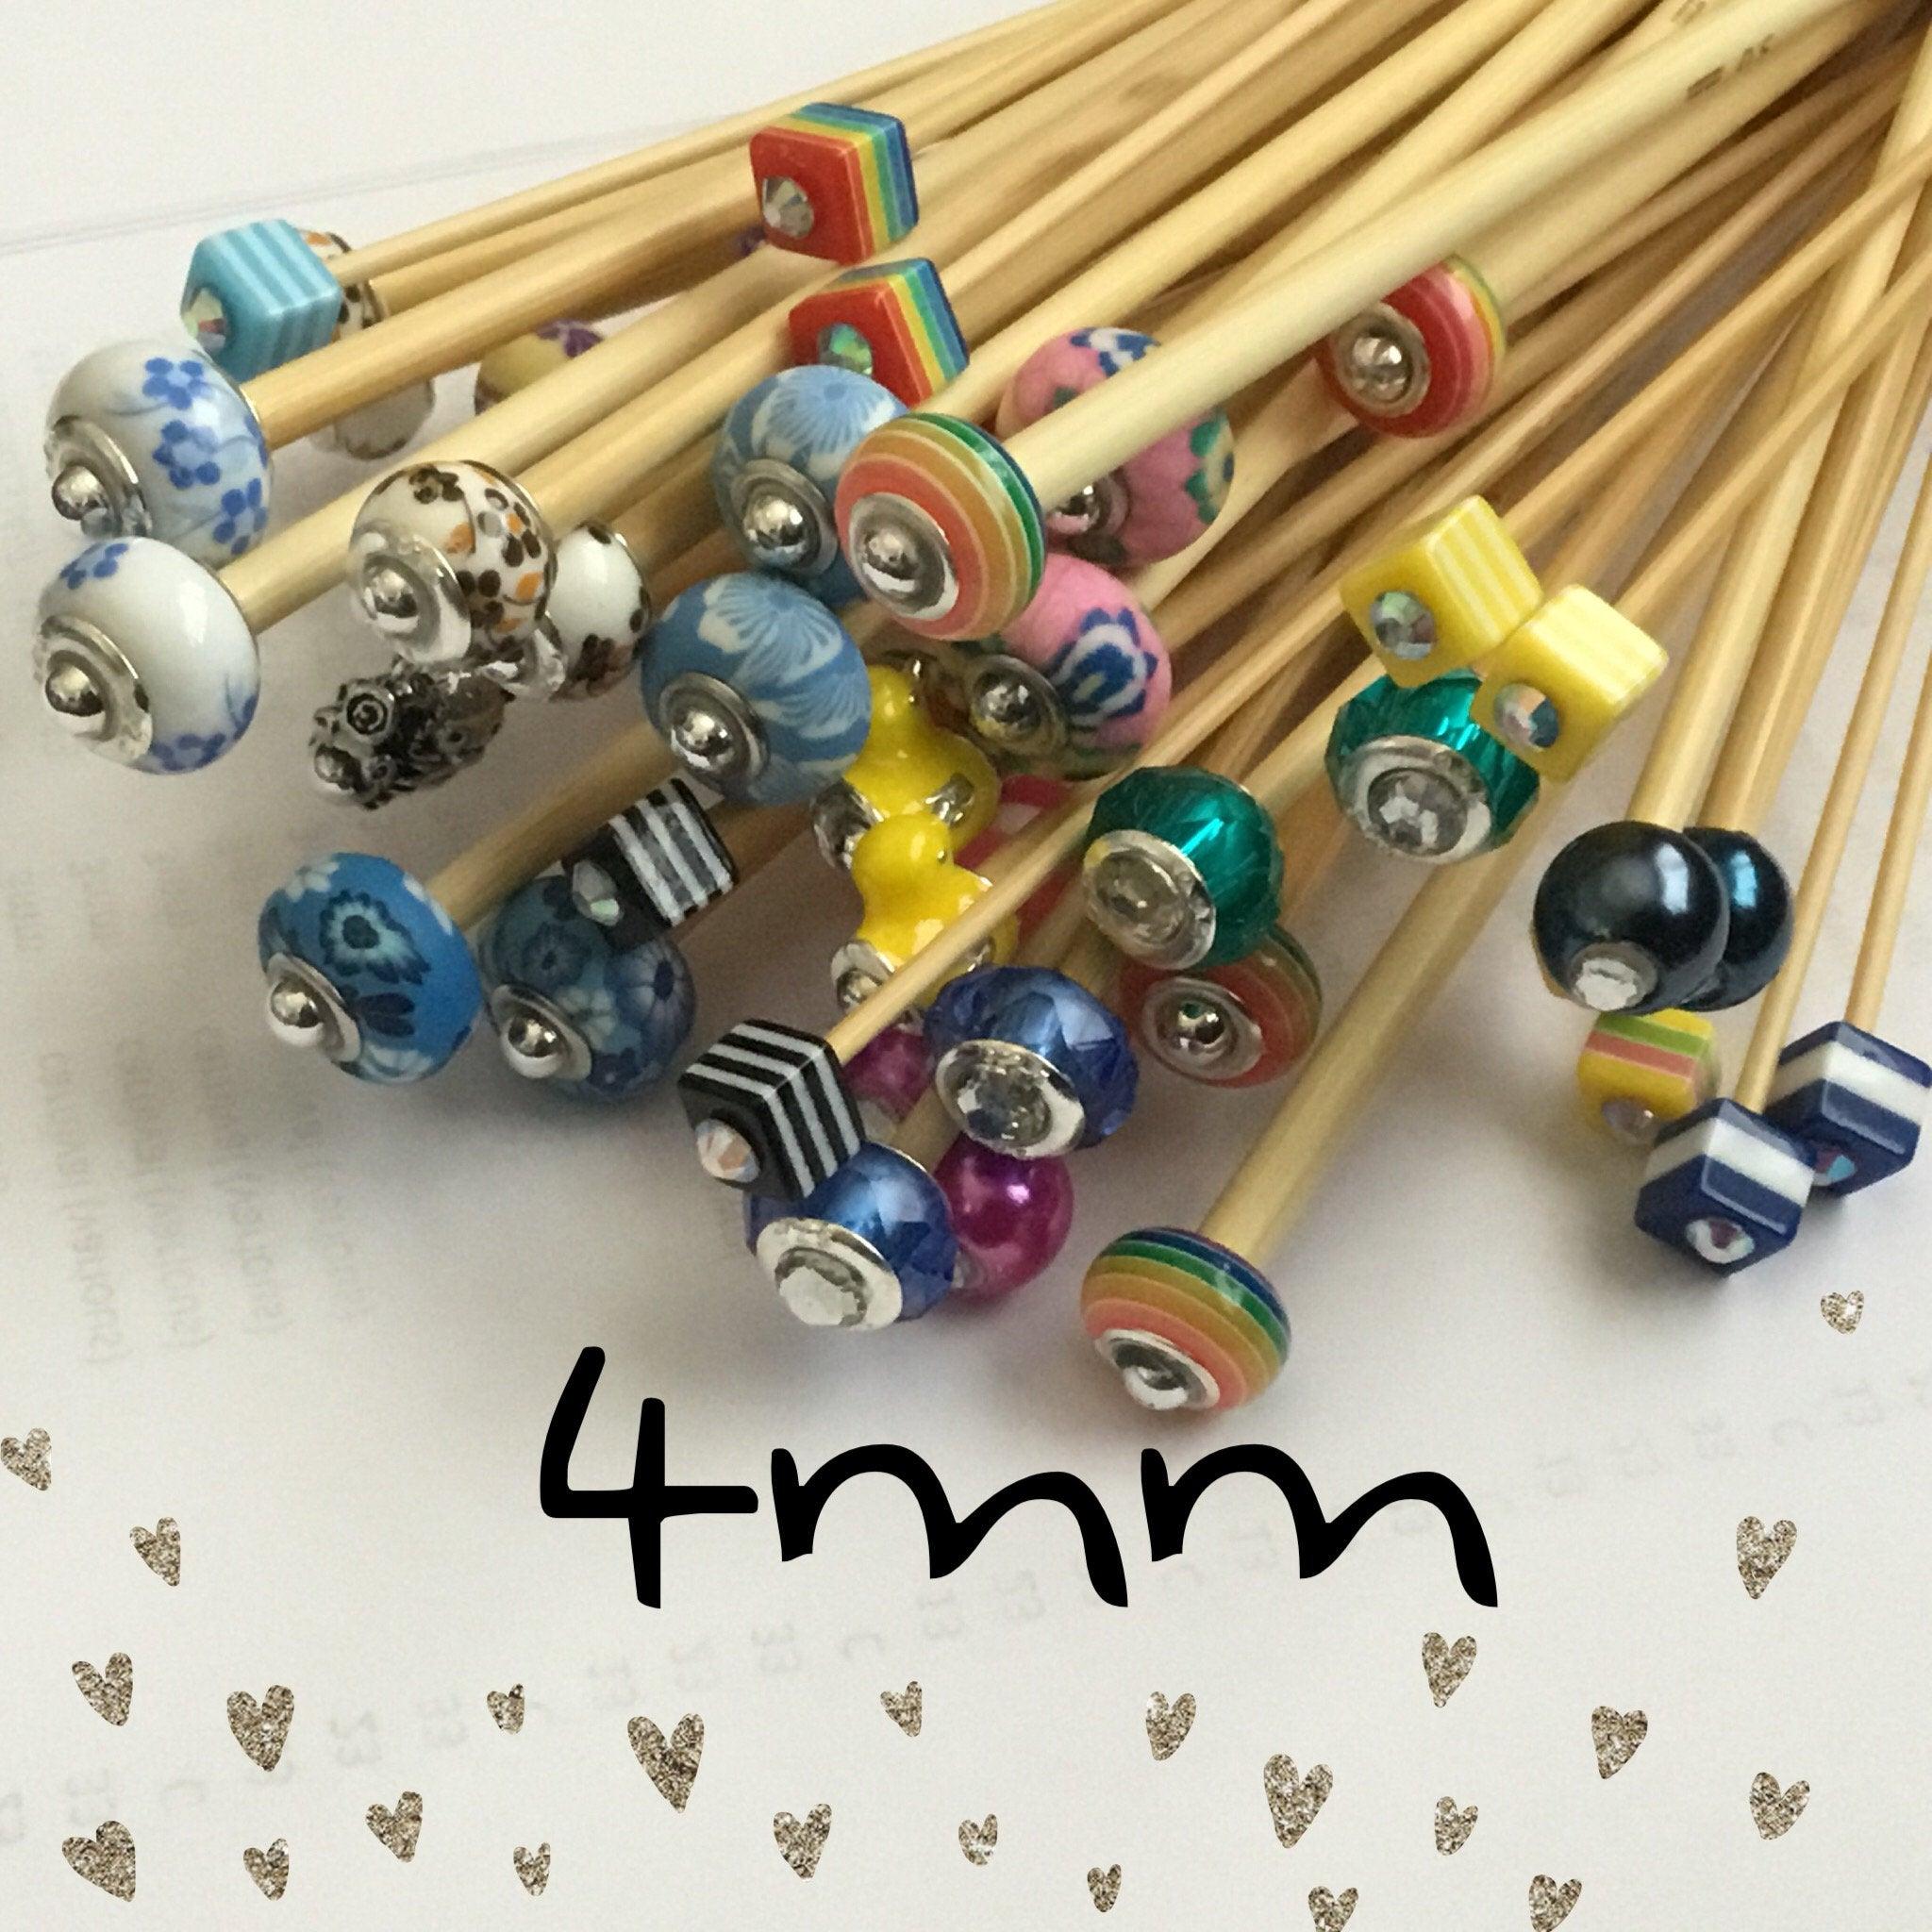 4mm Beaded Bamboo Knitting Needles/crochet Hook